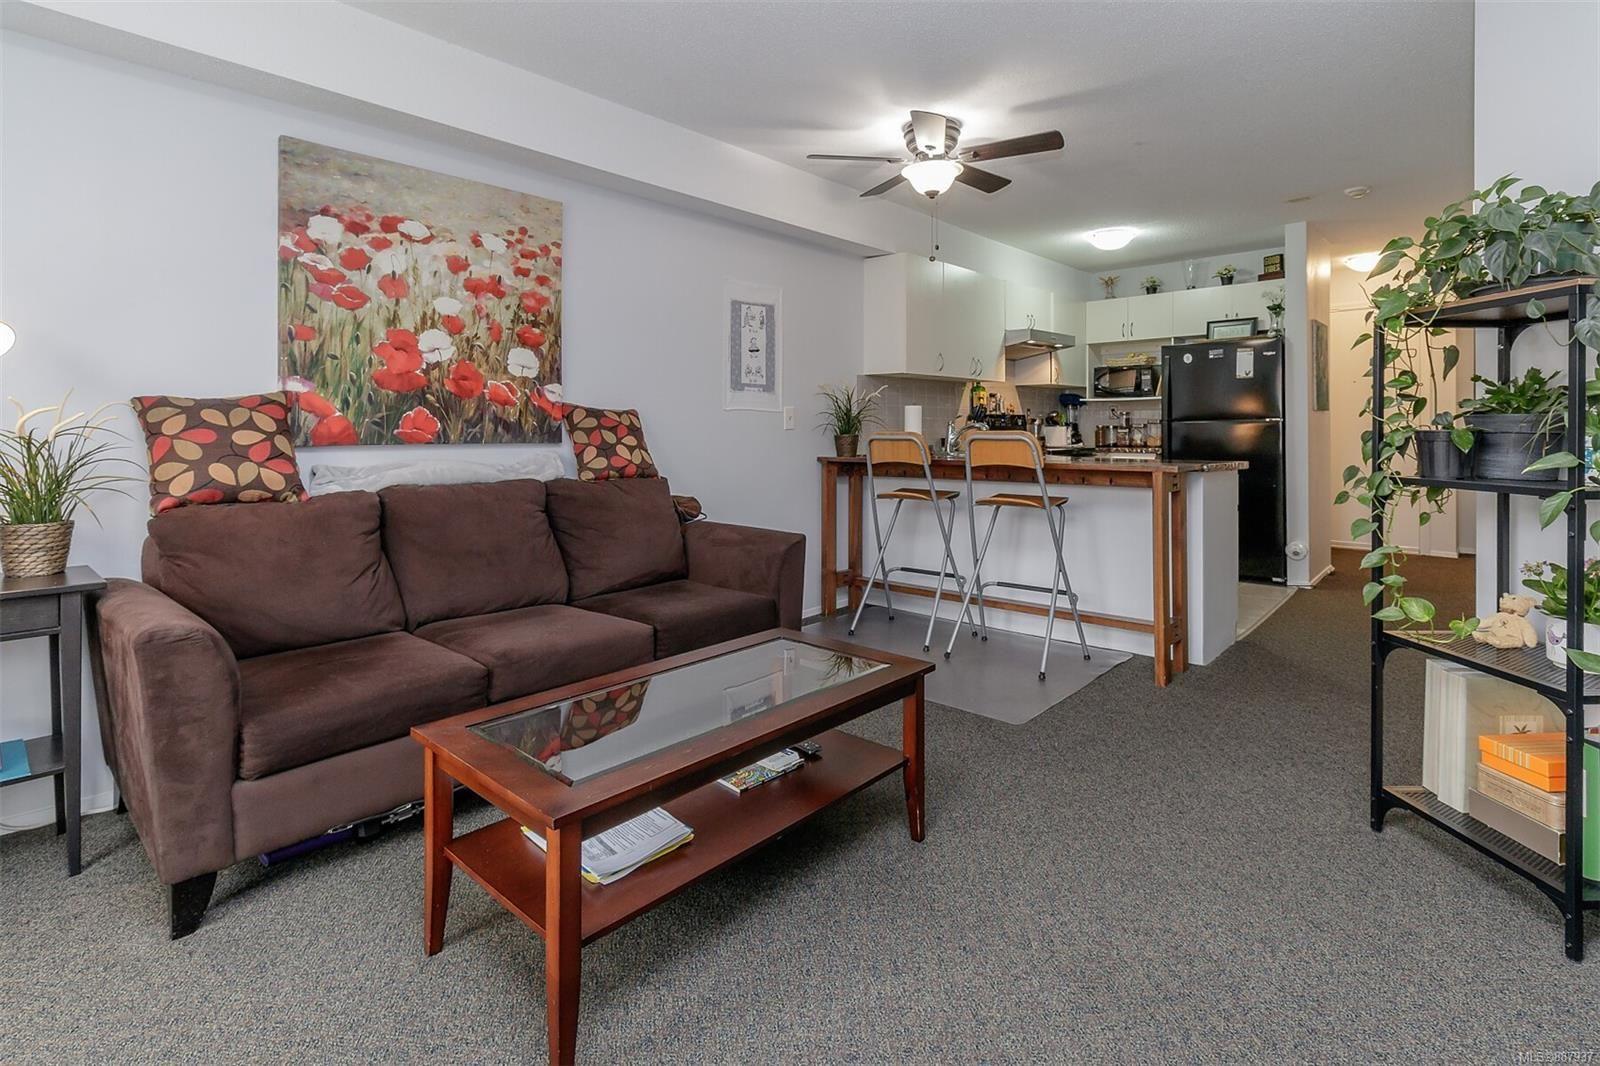 Main Photo: 109 3215 Cowichan Lake Rd in : Du West Duncan Condo for sale (Duncan)  : MLS®# 887937